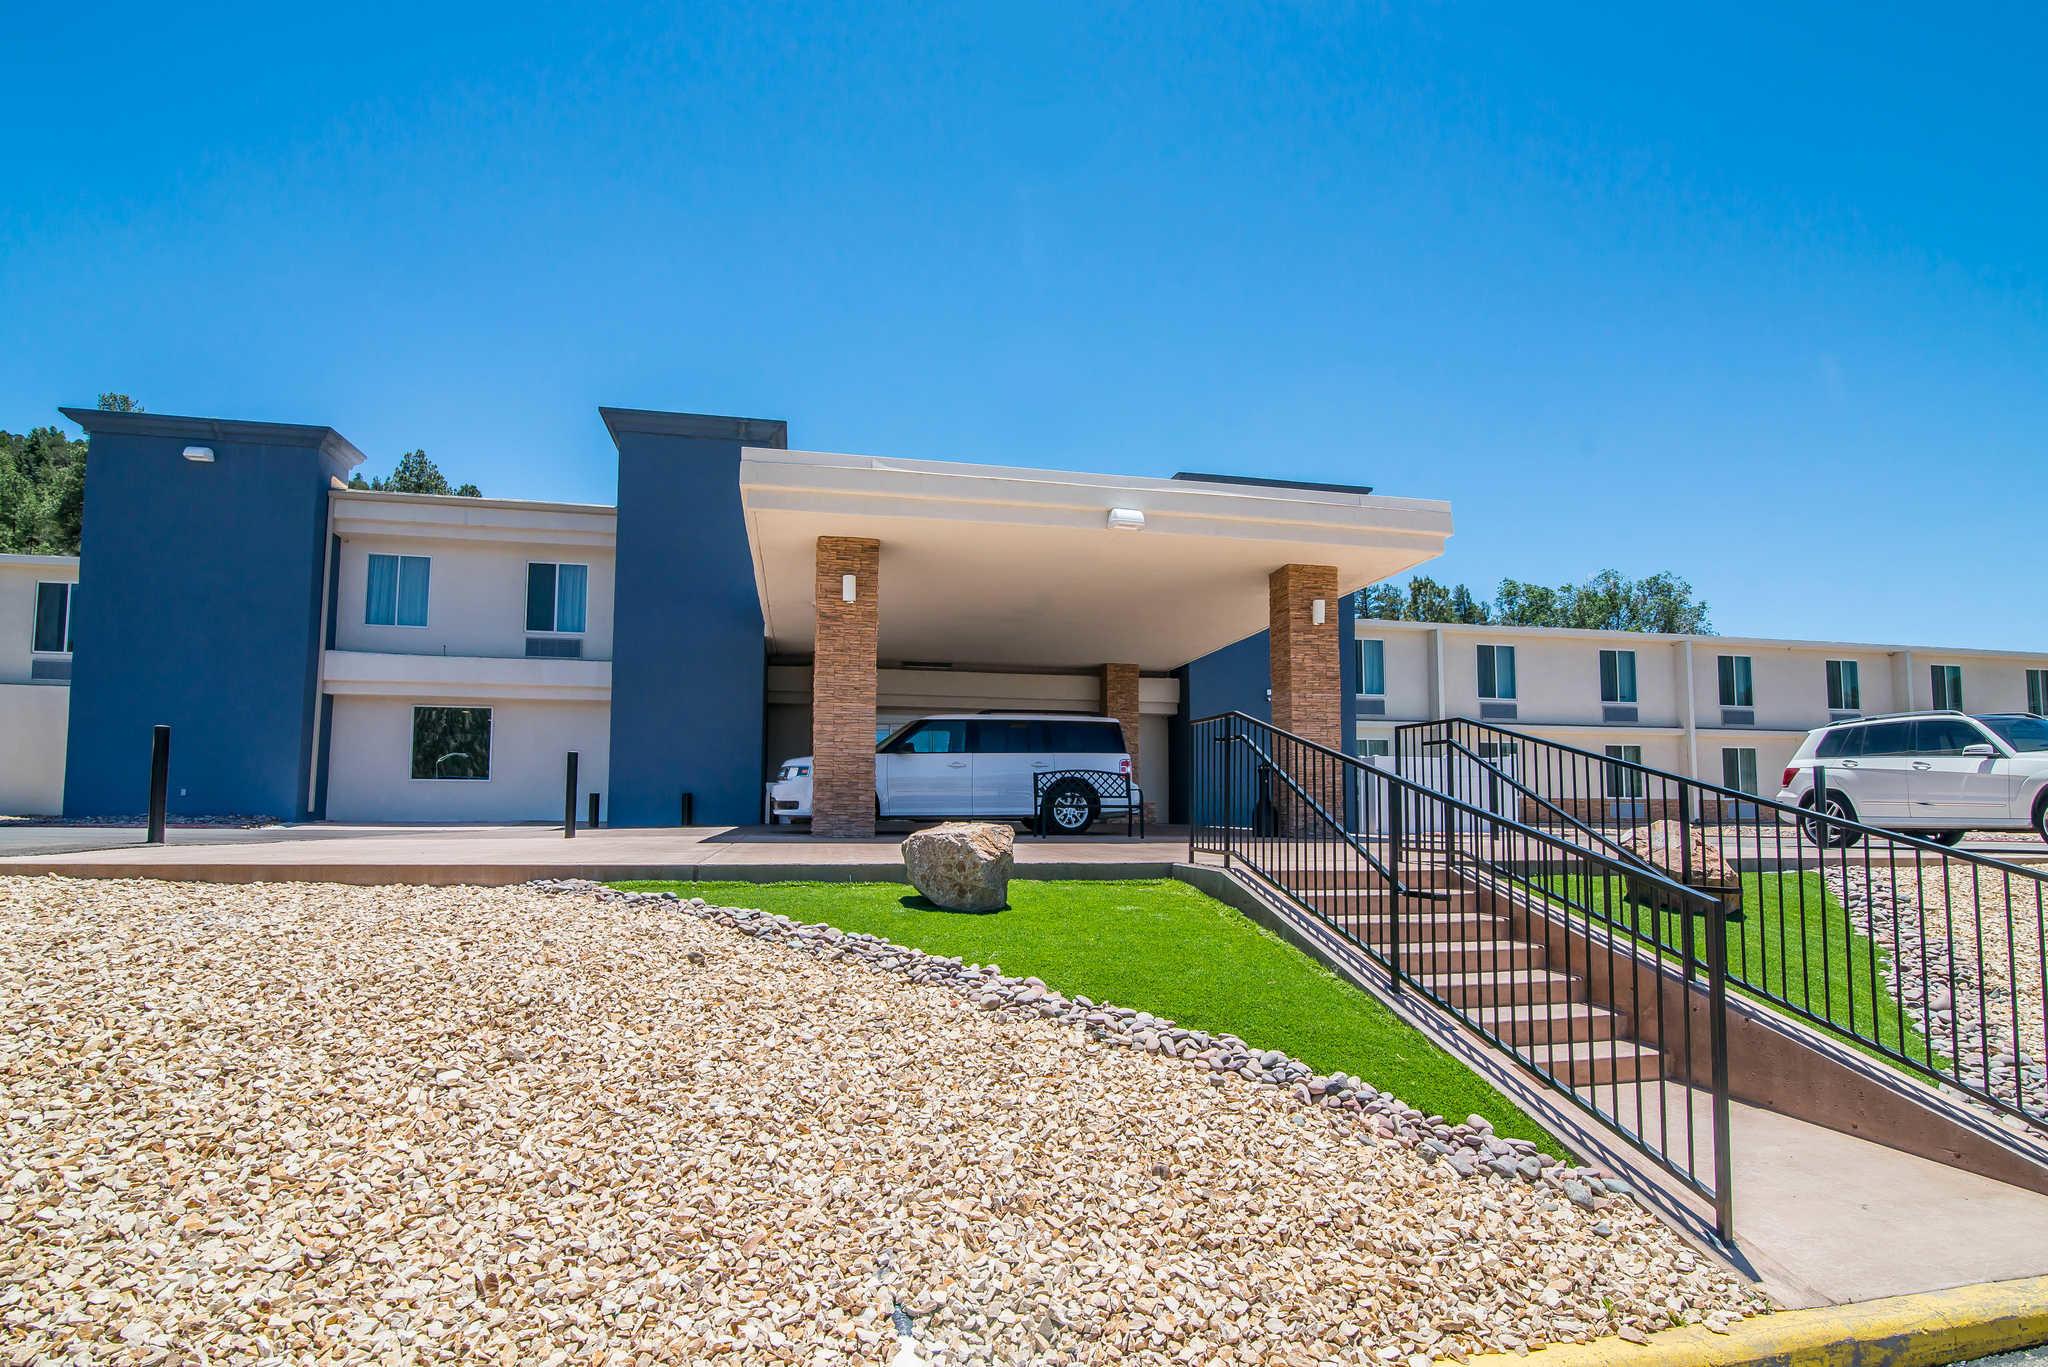 Quality Inn & Suites - Ruidoso Hwy 70 image 2